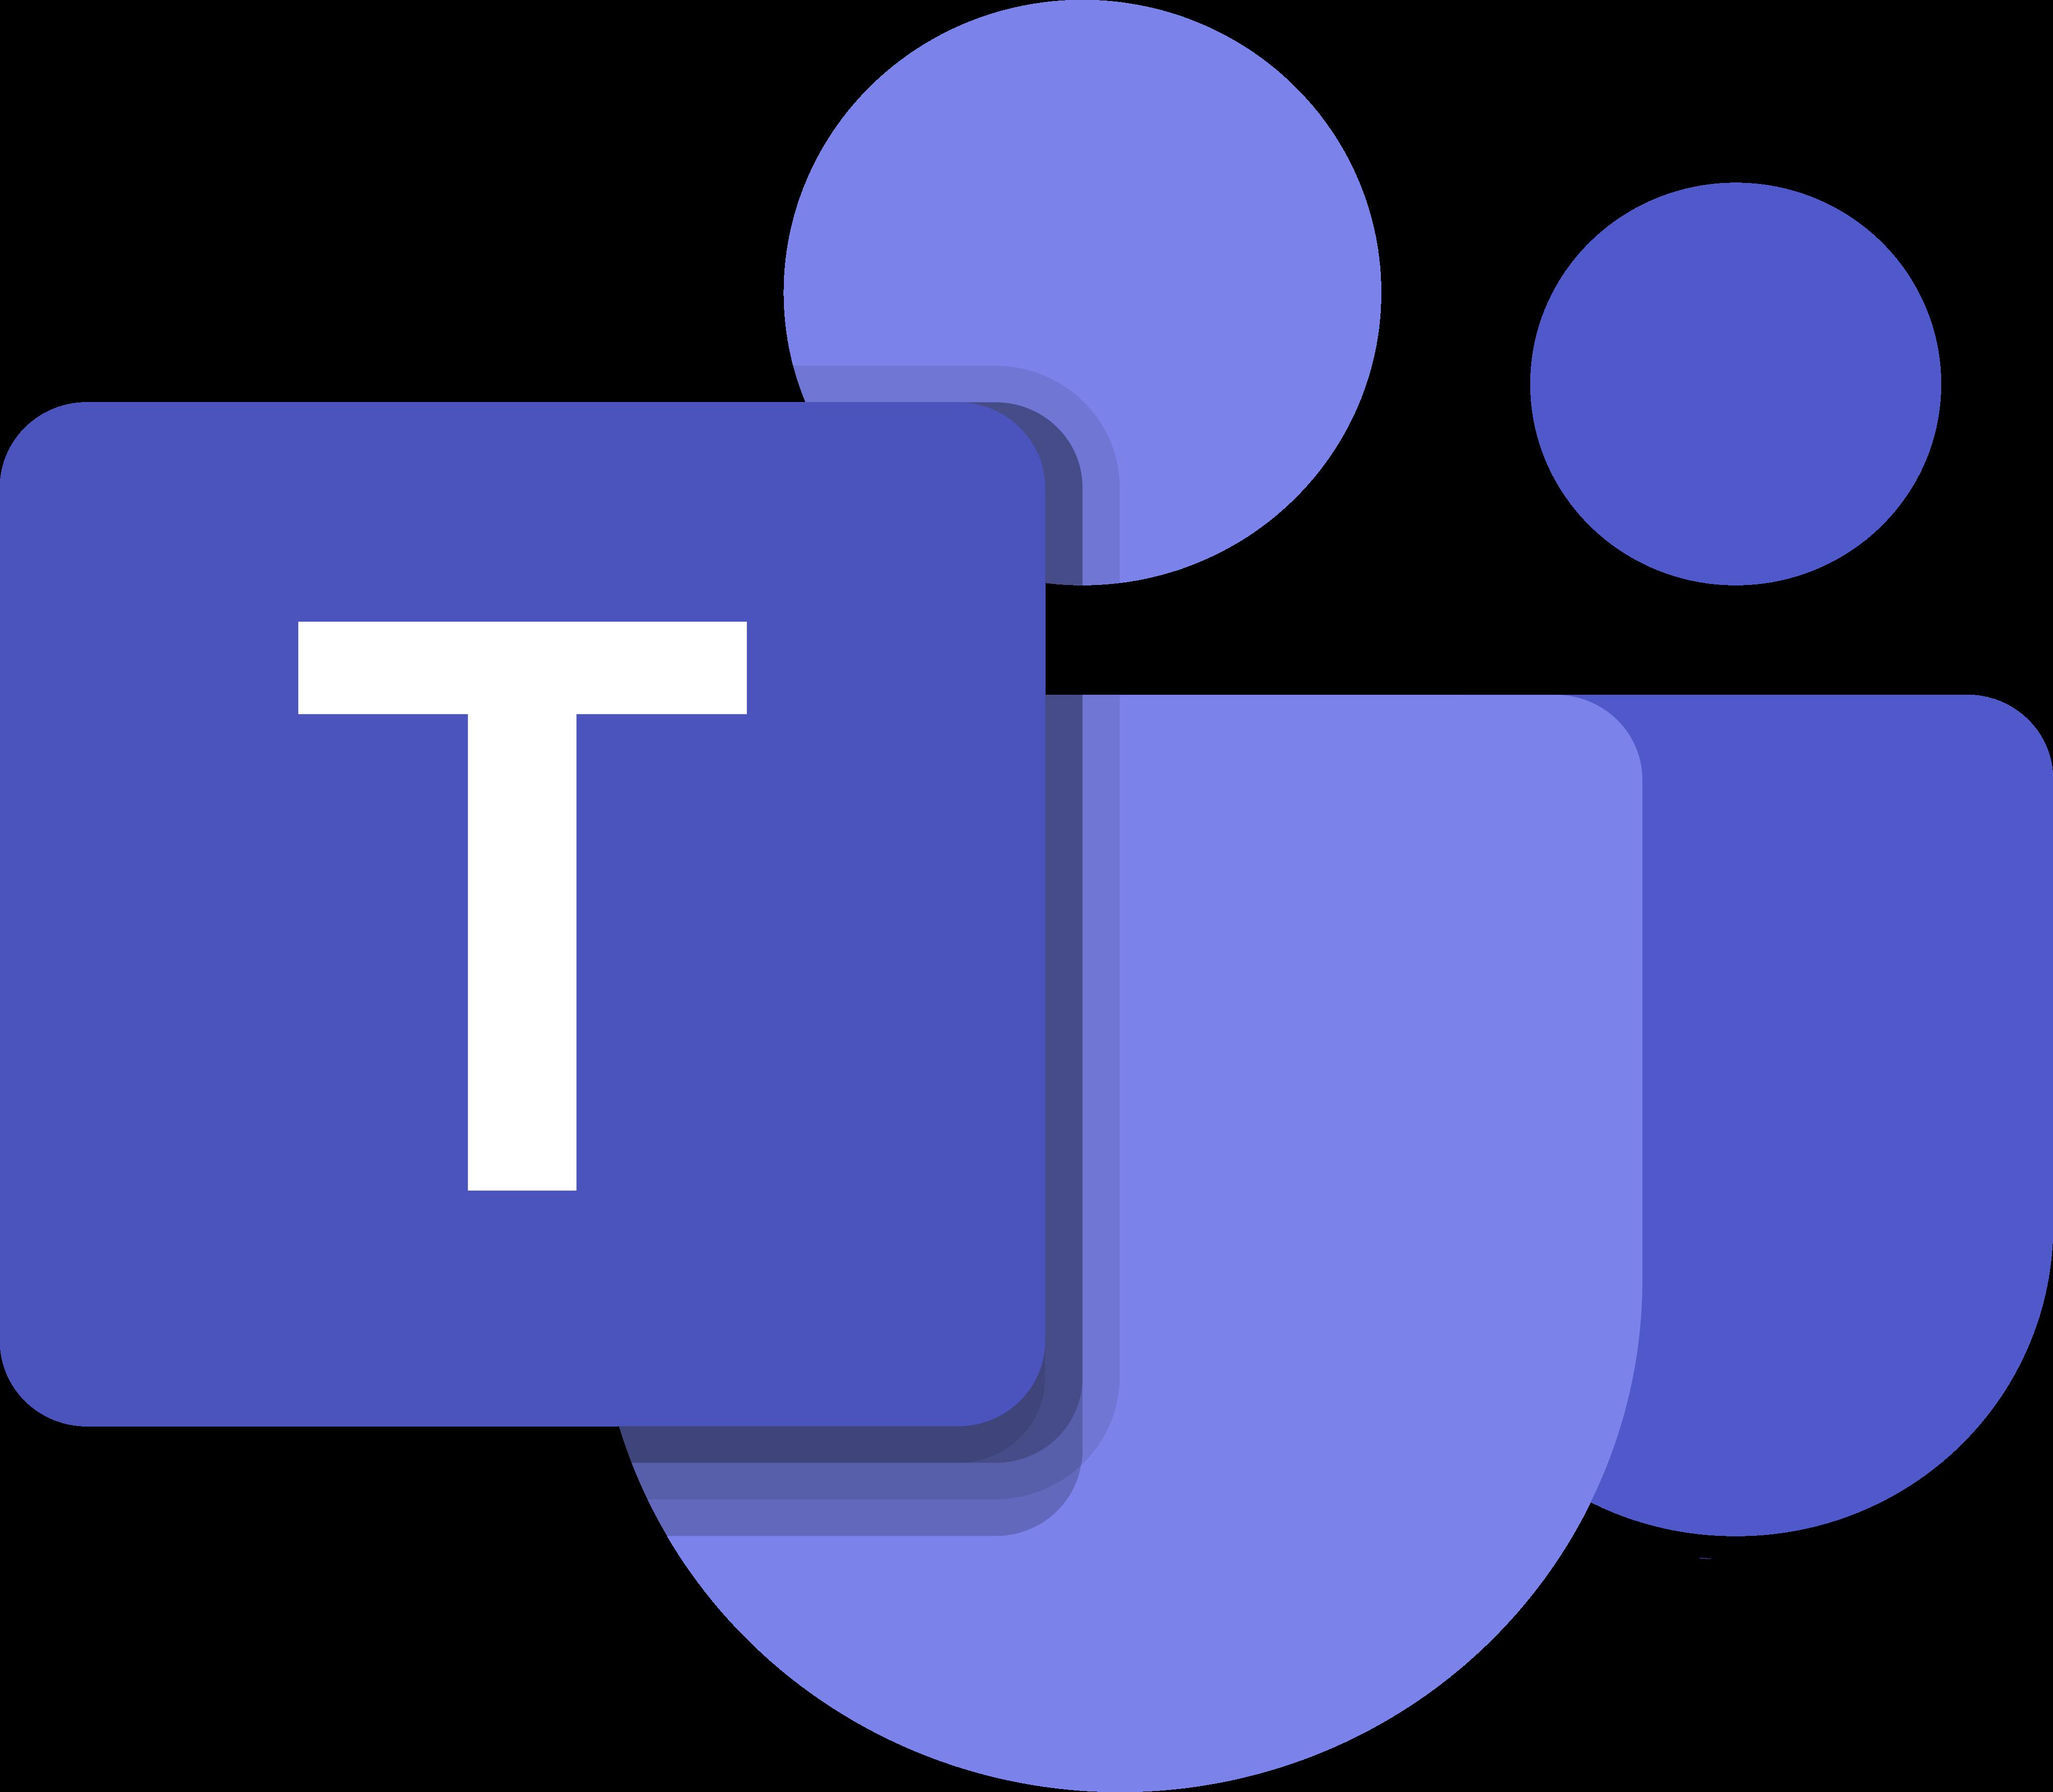 microsoft teams logo 1 - Microsoft Teams Logo